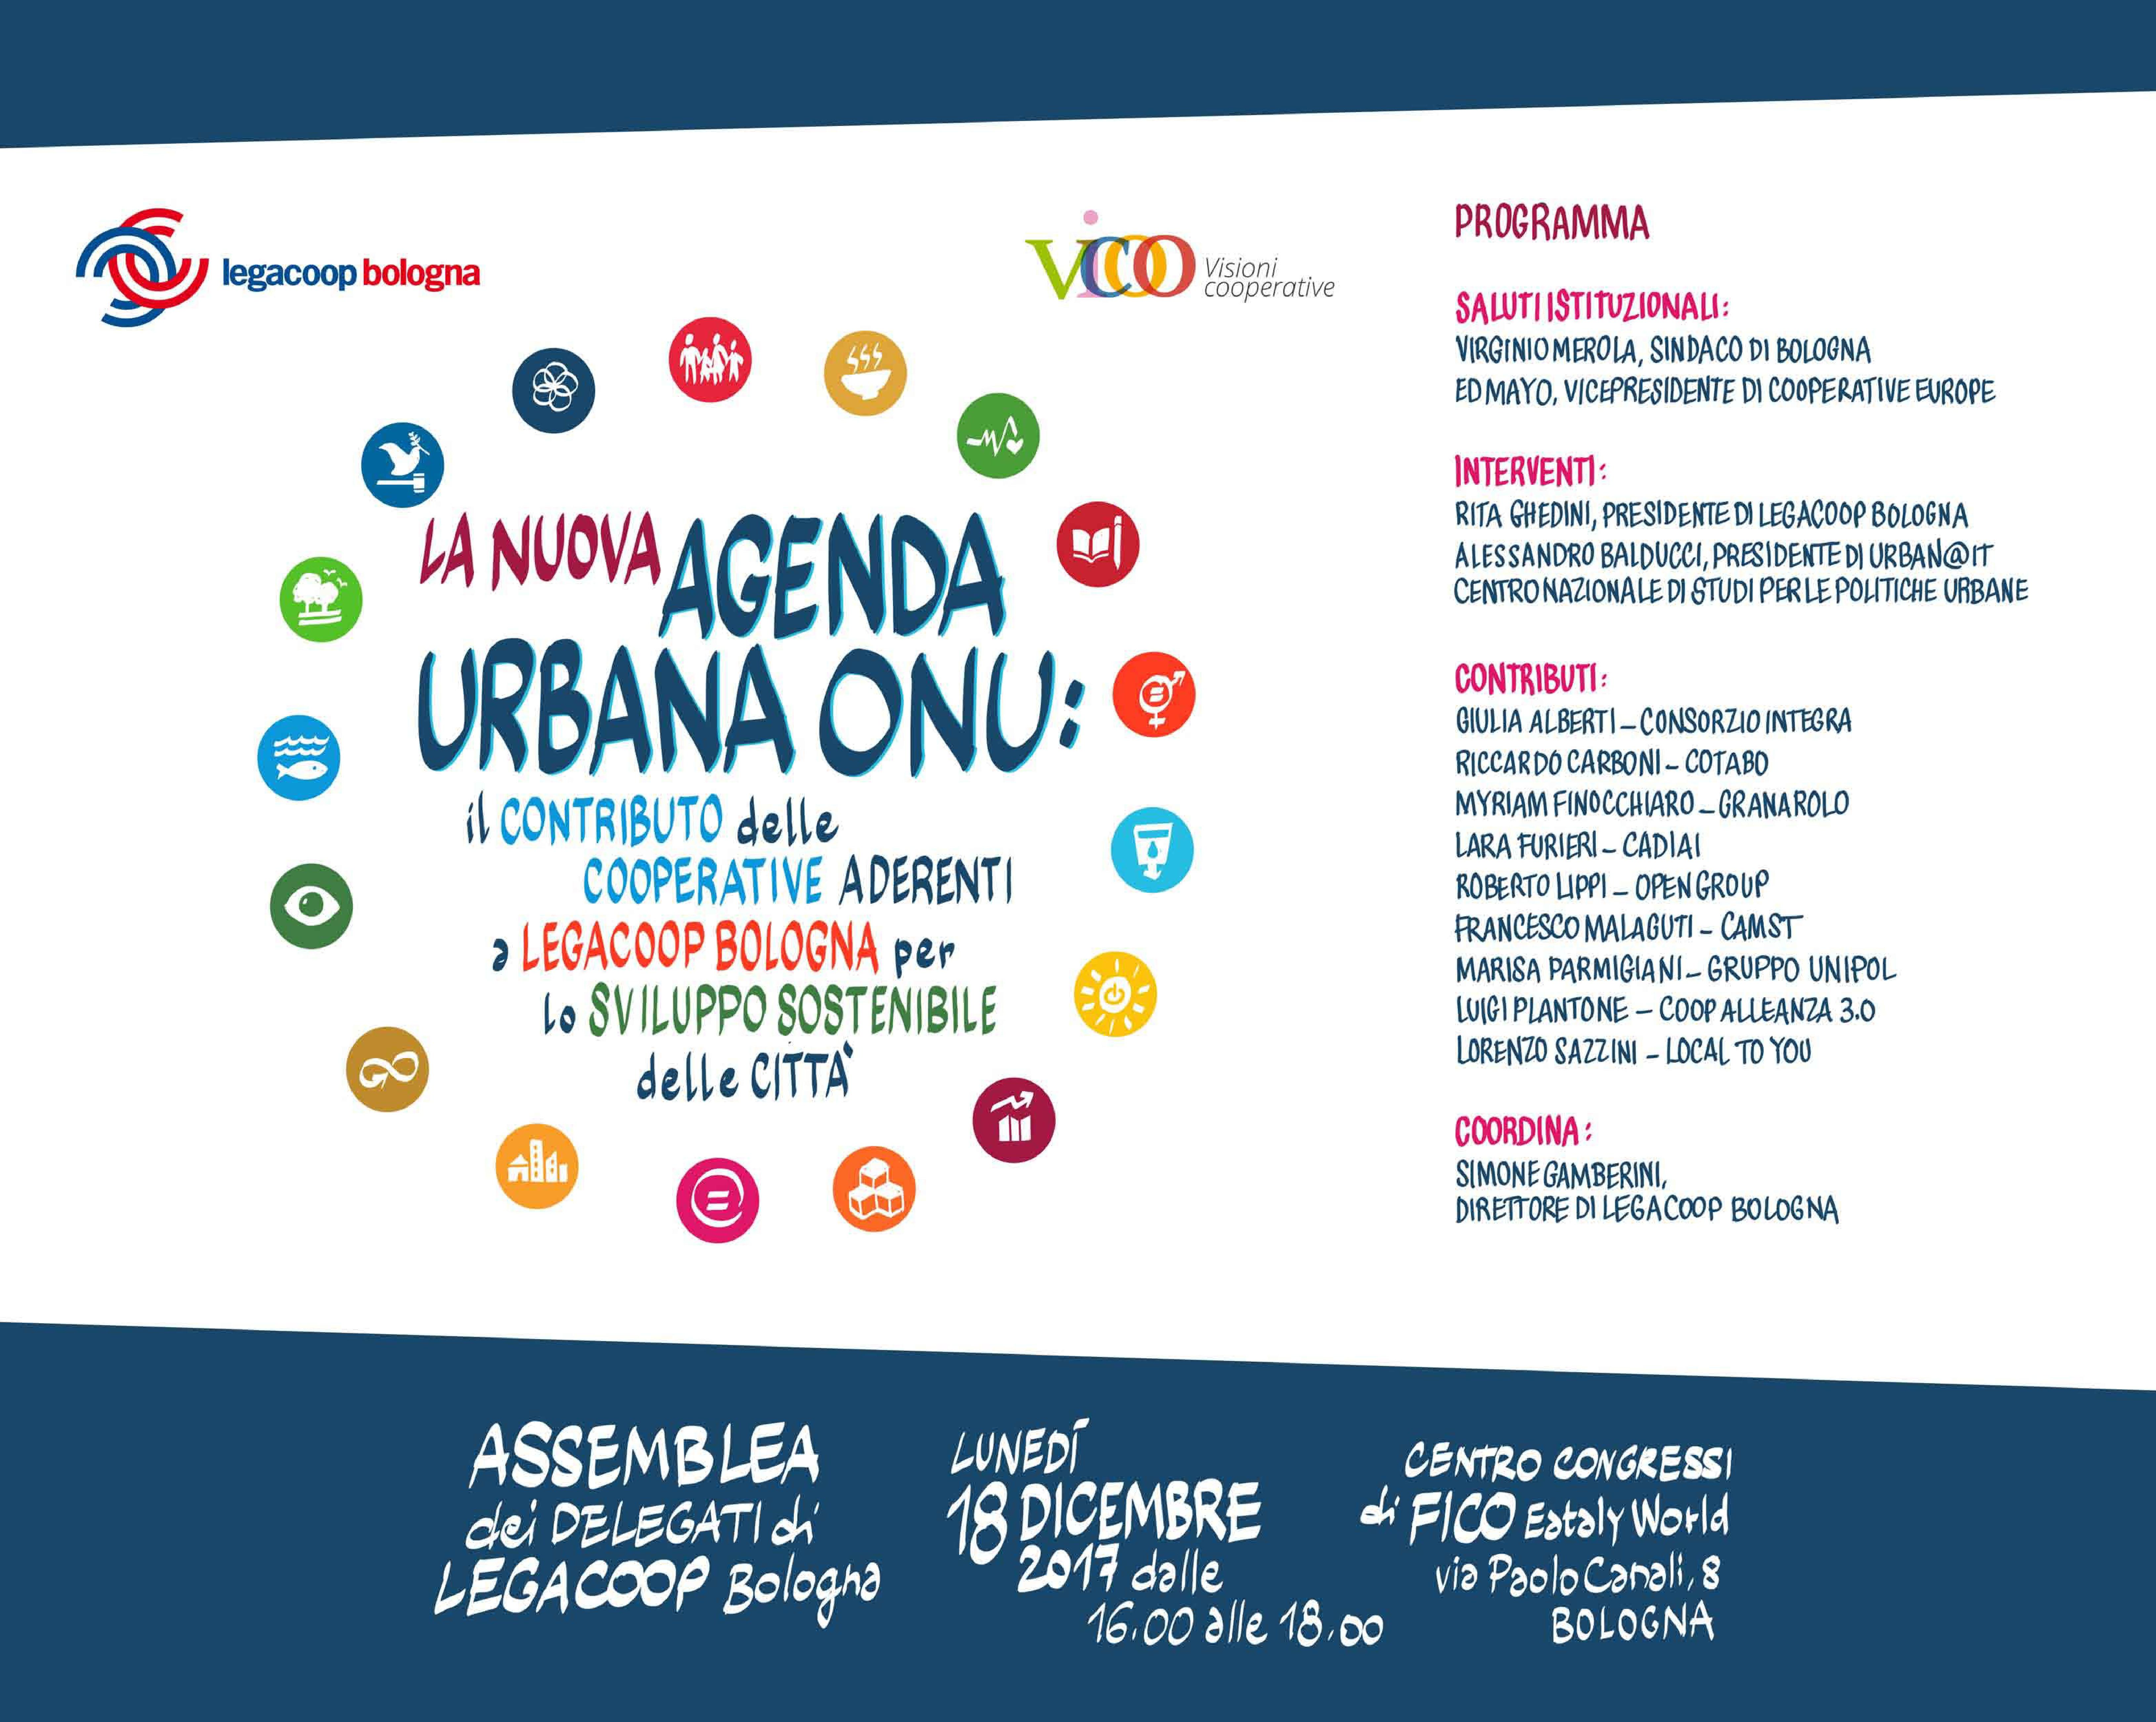 invito2_assemblea_legacoop_18.12.17_programma (1)